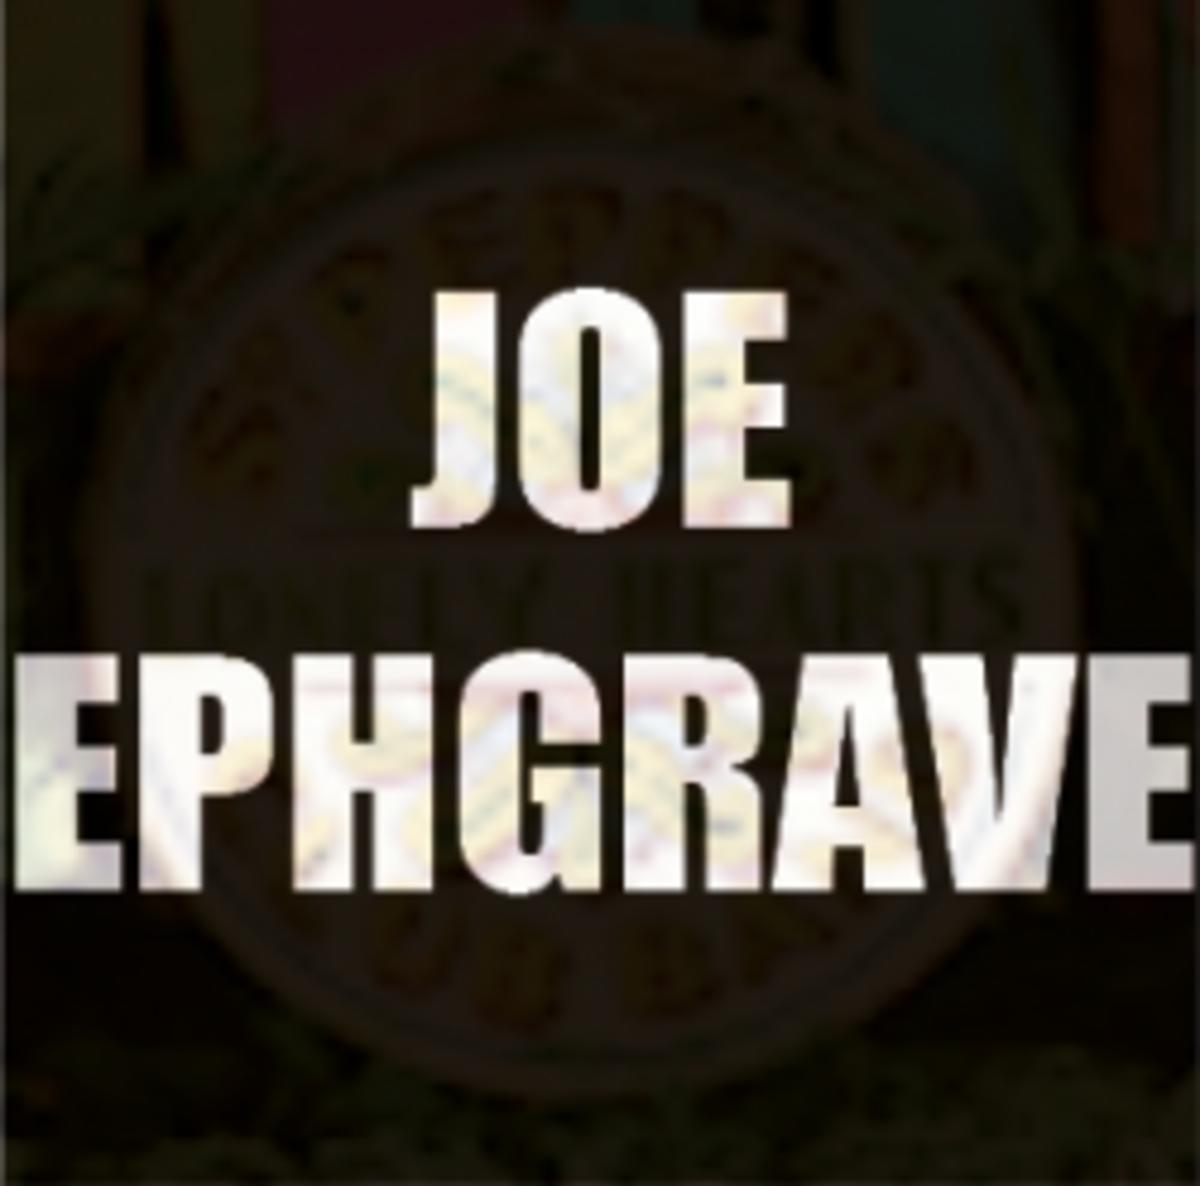 joe-ephgrave